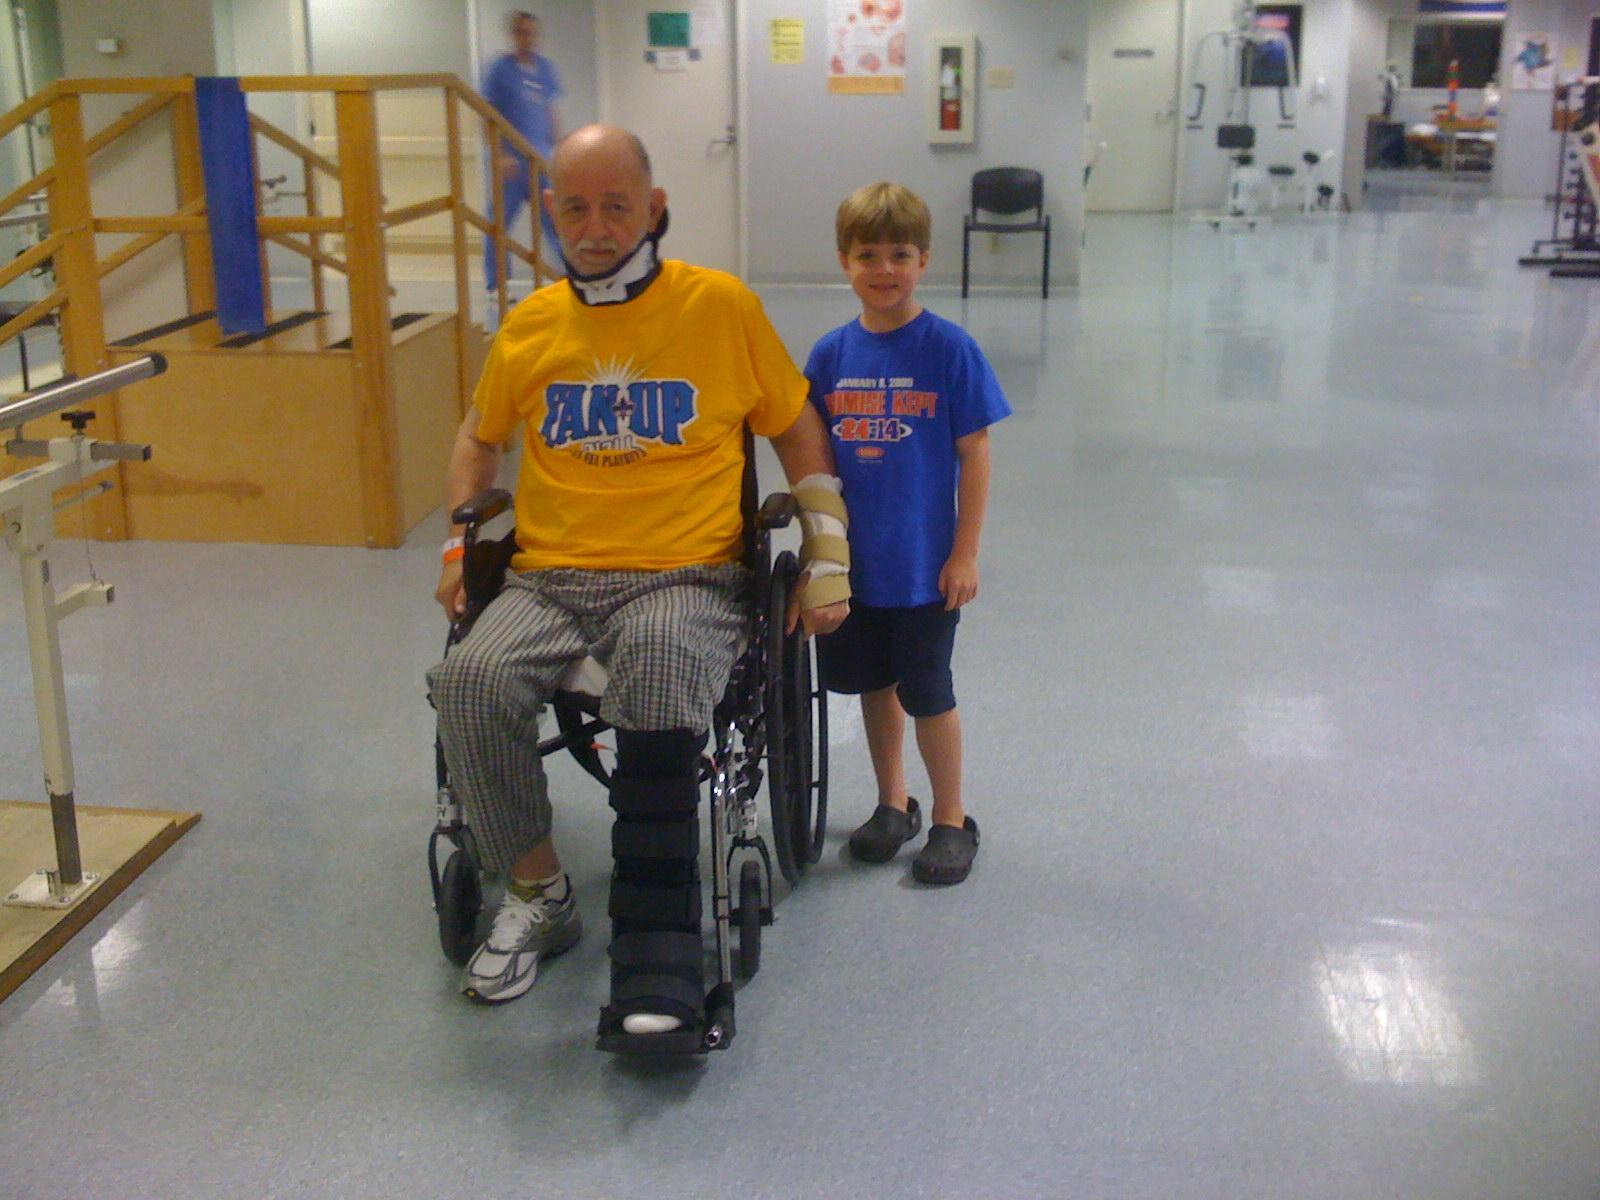 Pop pushing his wheelchair on his own. Caleb following close behind.